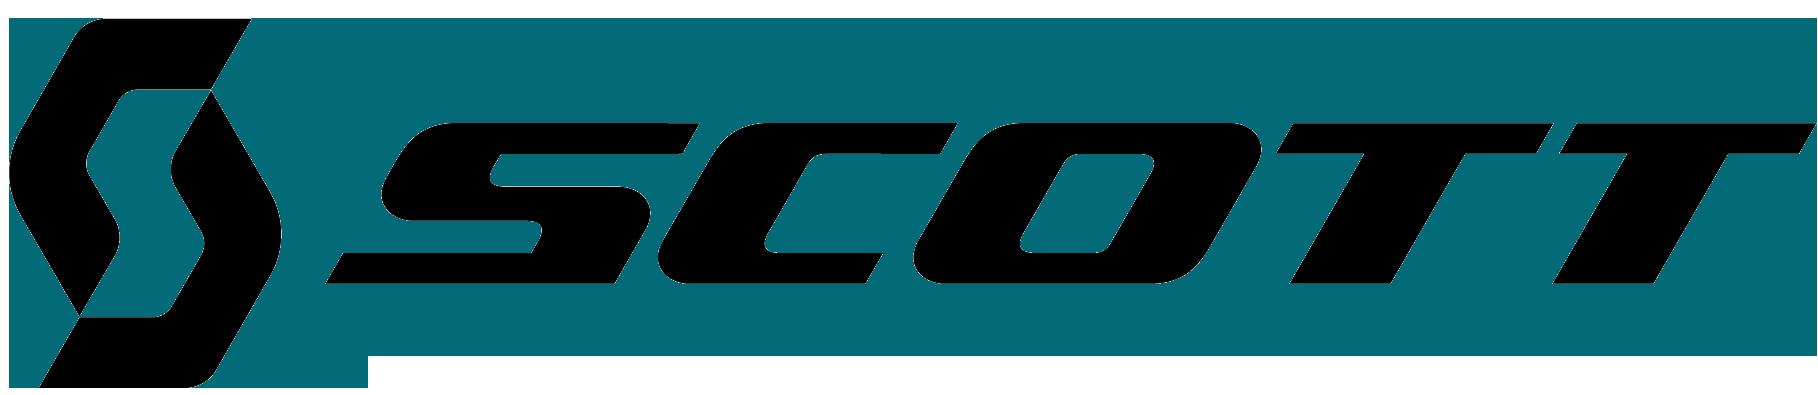 sponsor 3